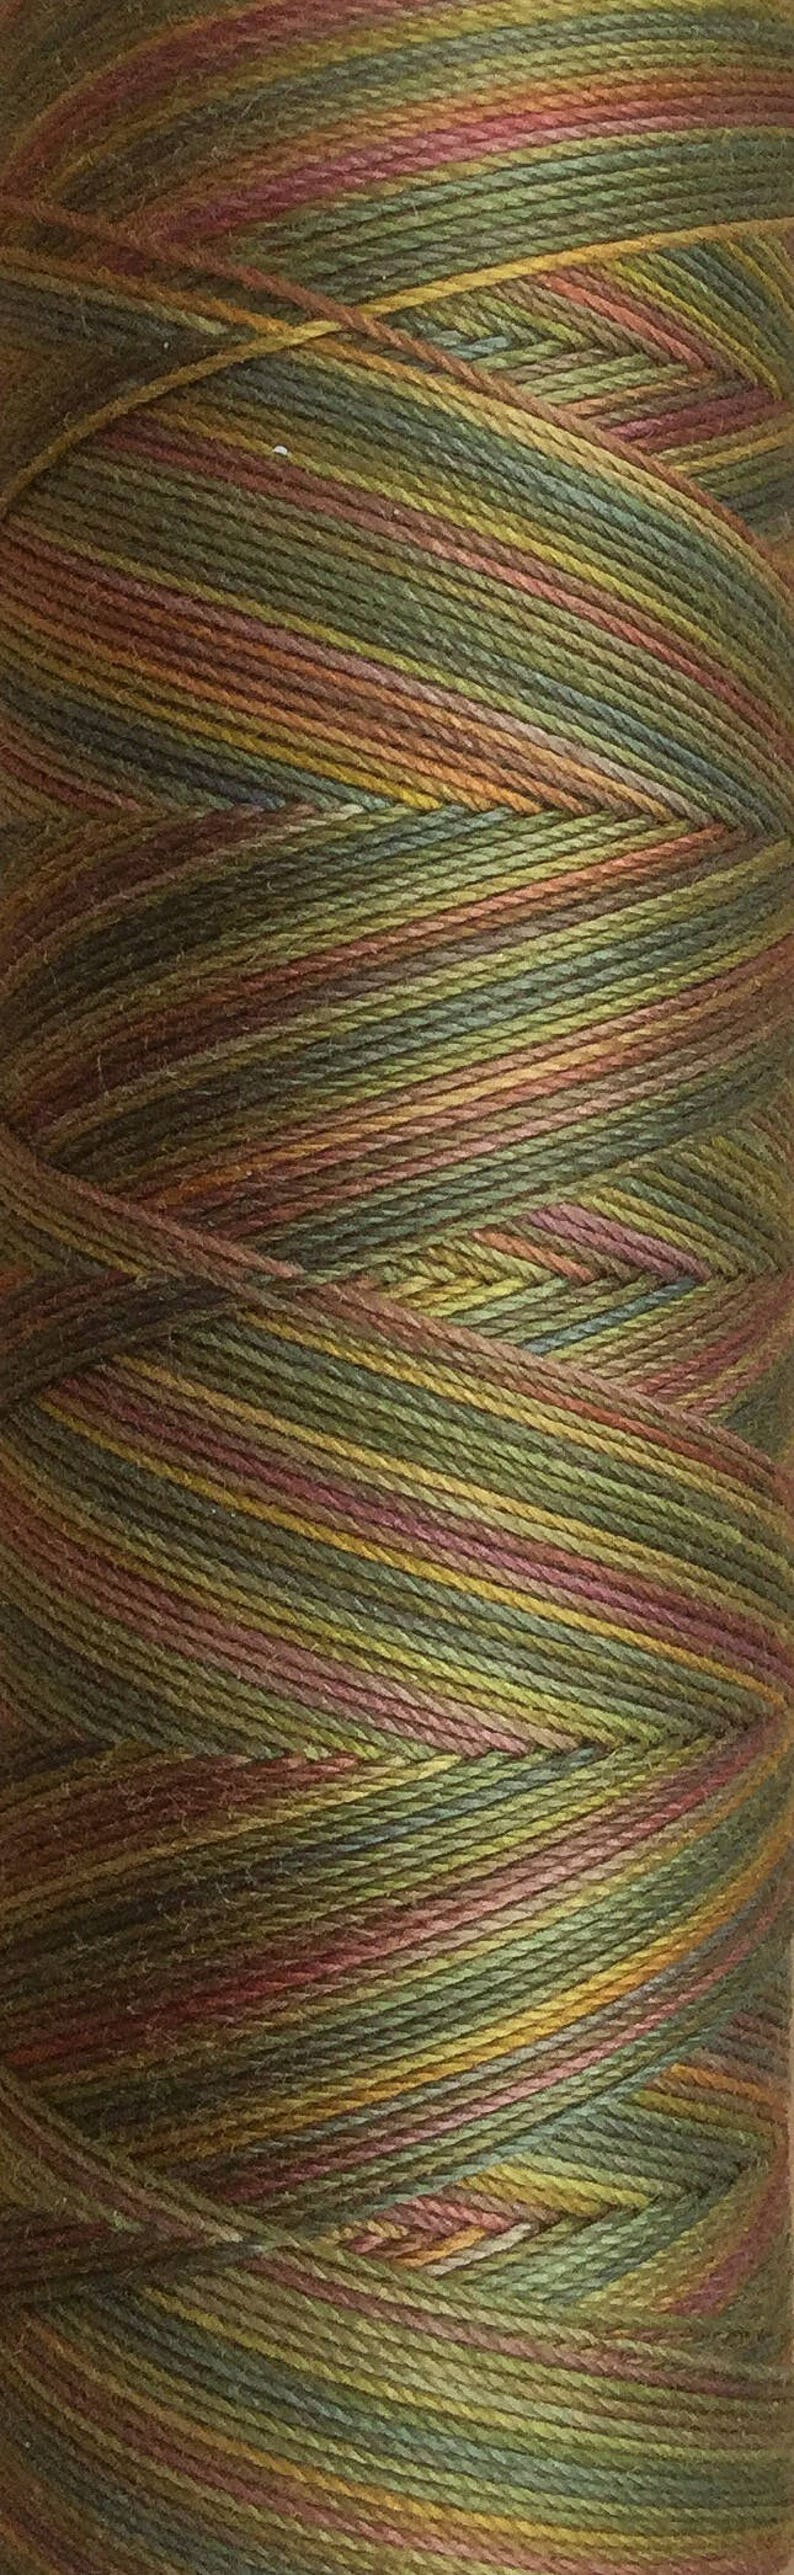 No.15 Sludgy Green Hand Dyed Cotton Machine Thread image 0